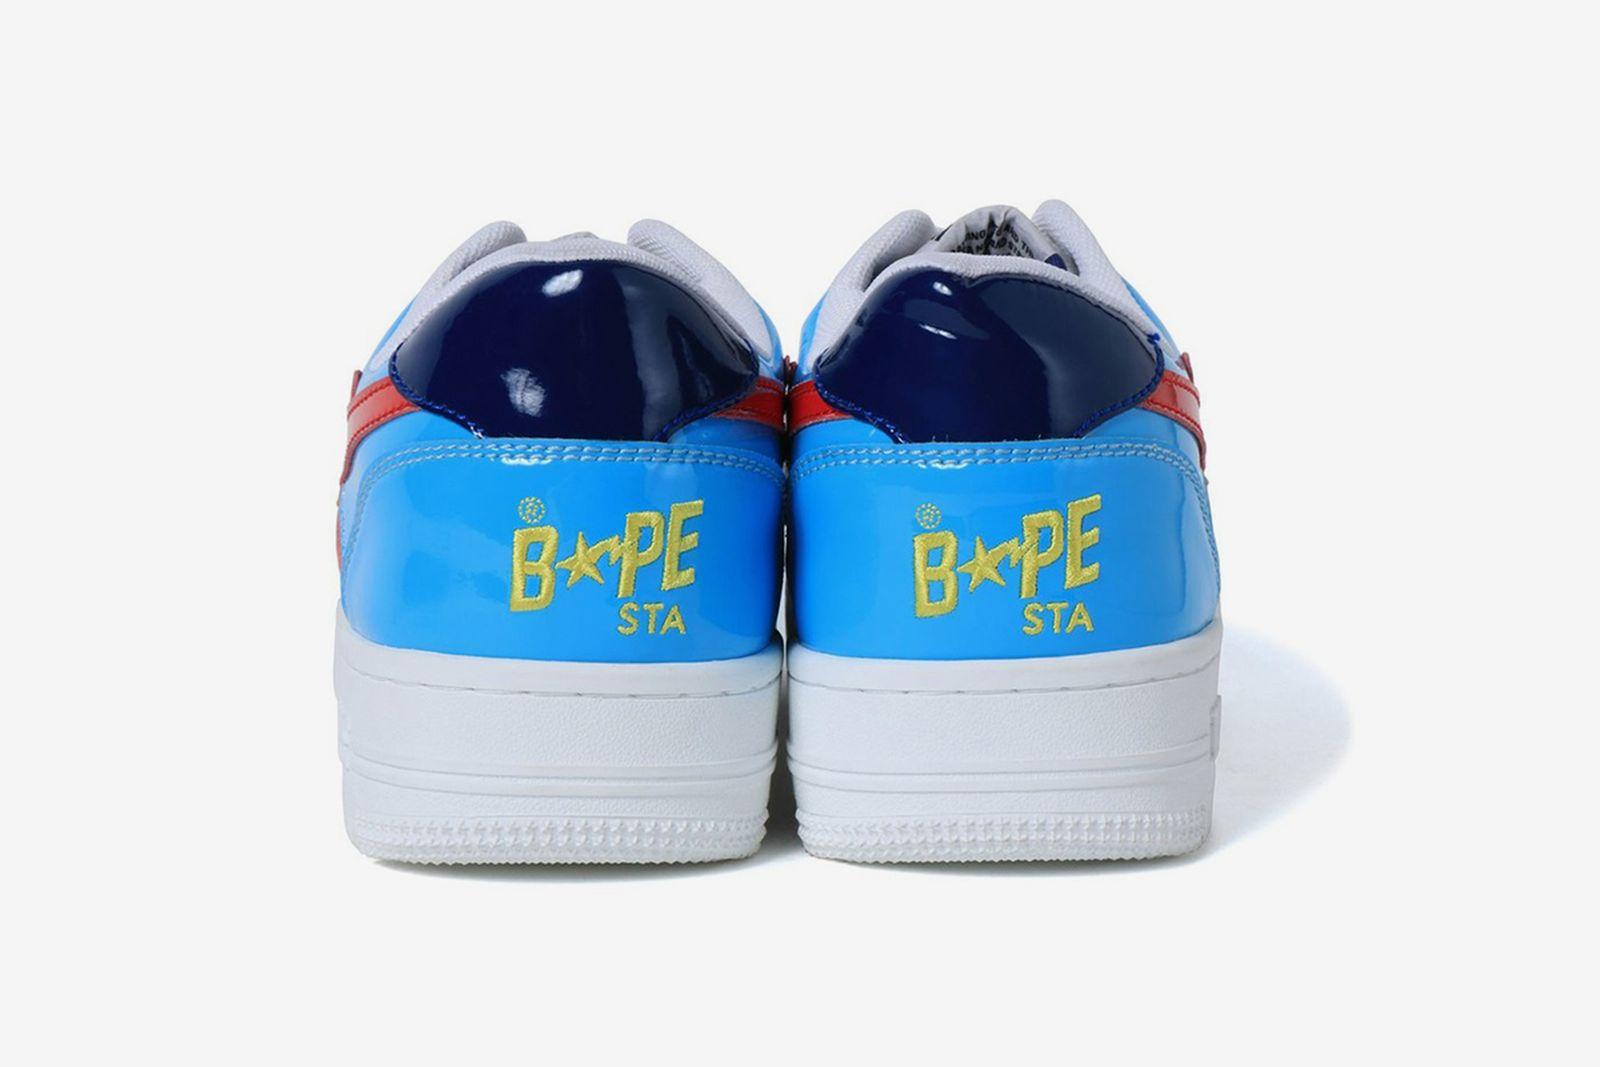 bape bapesta ss19 release date price A Bathing Ape